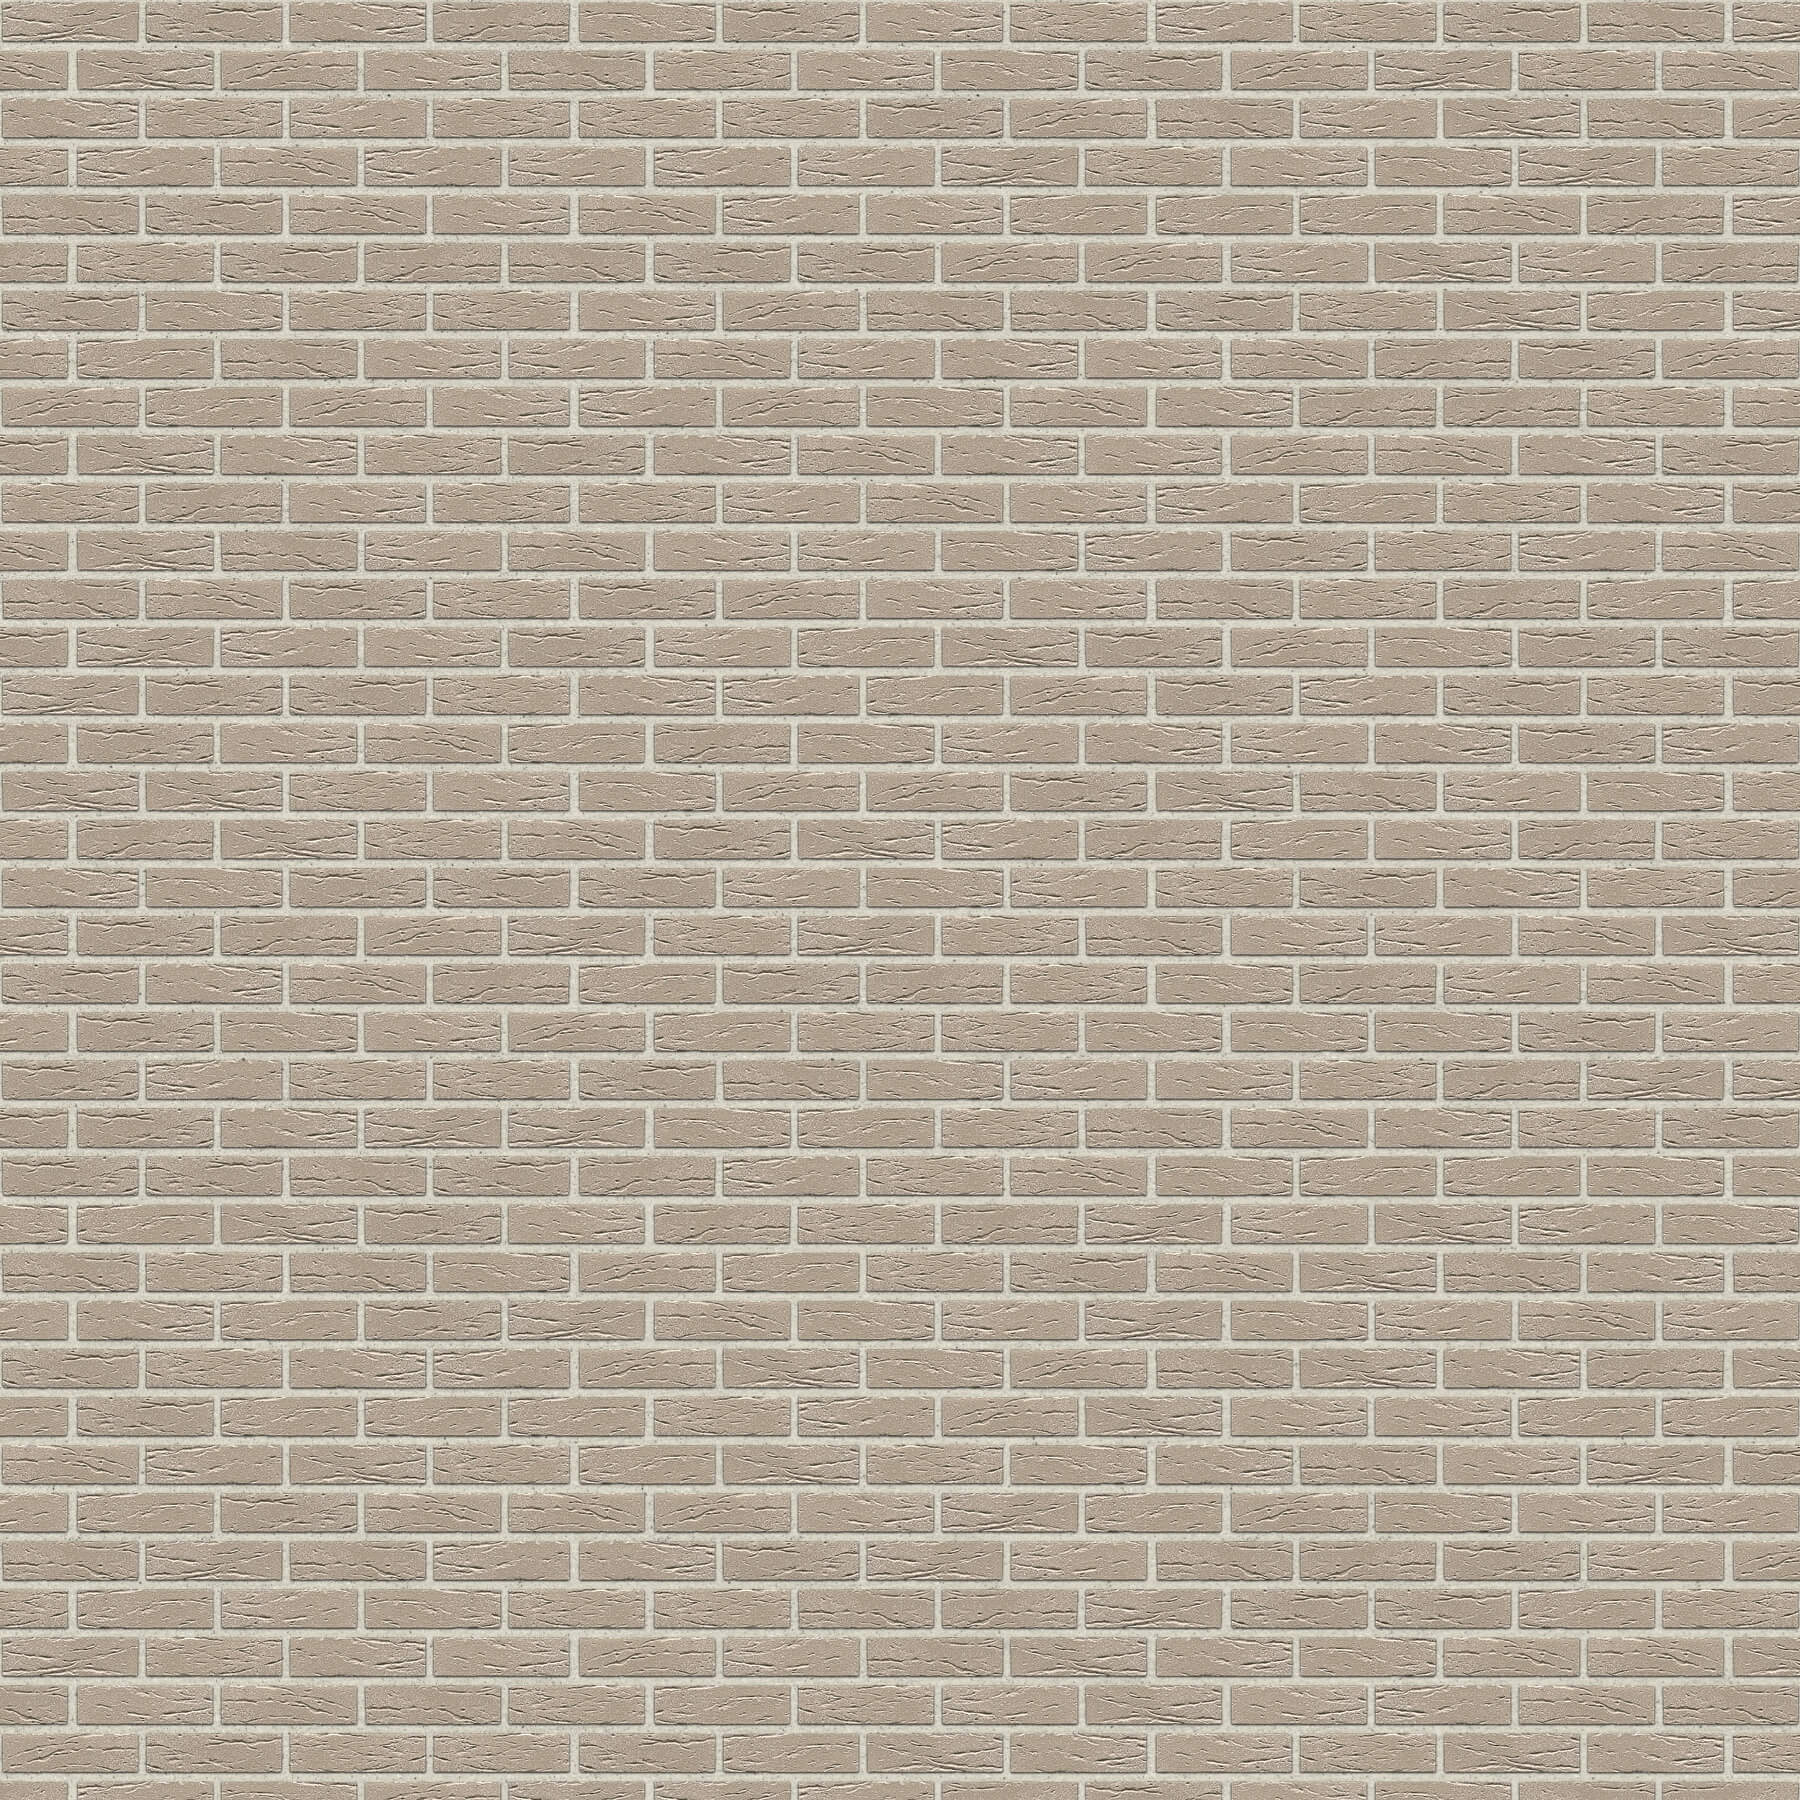 Dekorativna cigla listela FeldHaus Klinker r-835 nf Bela Fuga